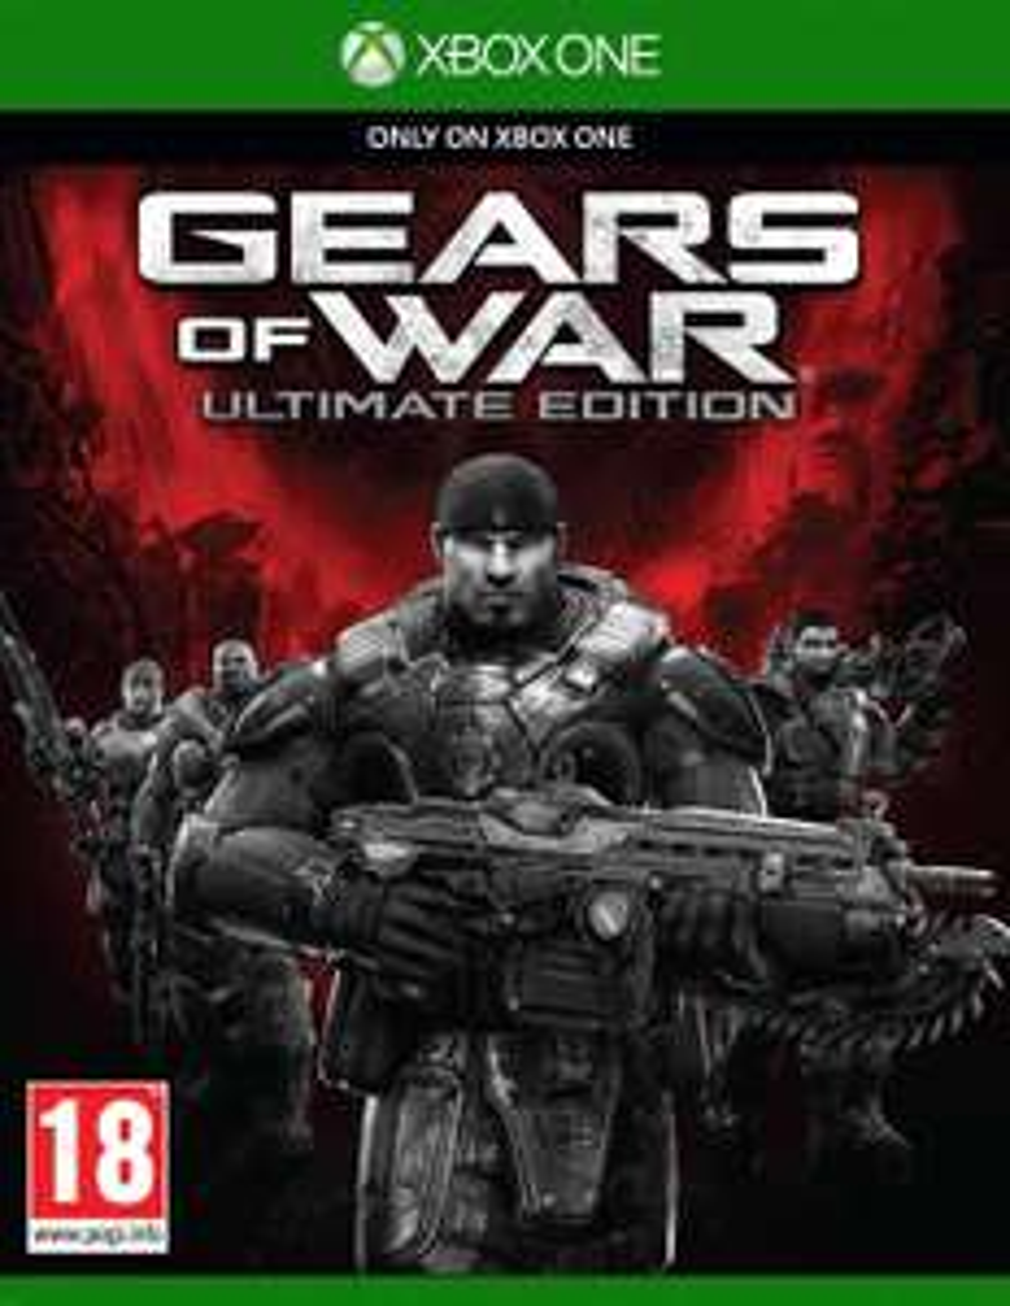 [CDkeys] Gears of War : Ultimate Edition - Xbox One - Digital Code (Digital Download) - Paypal